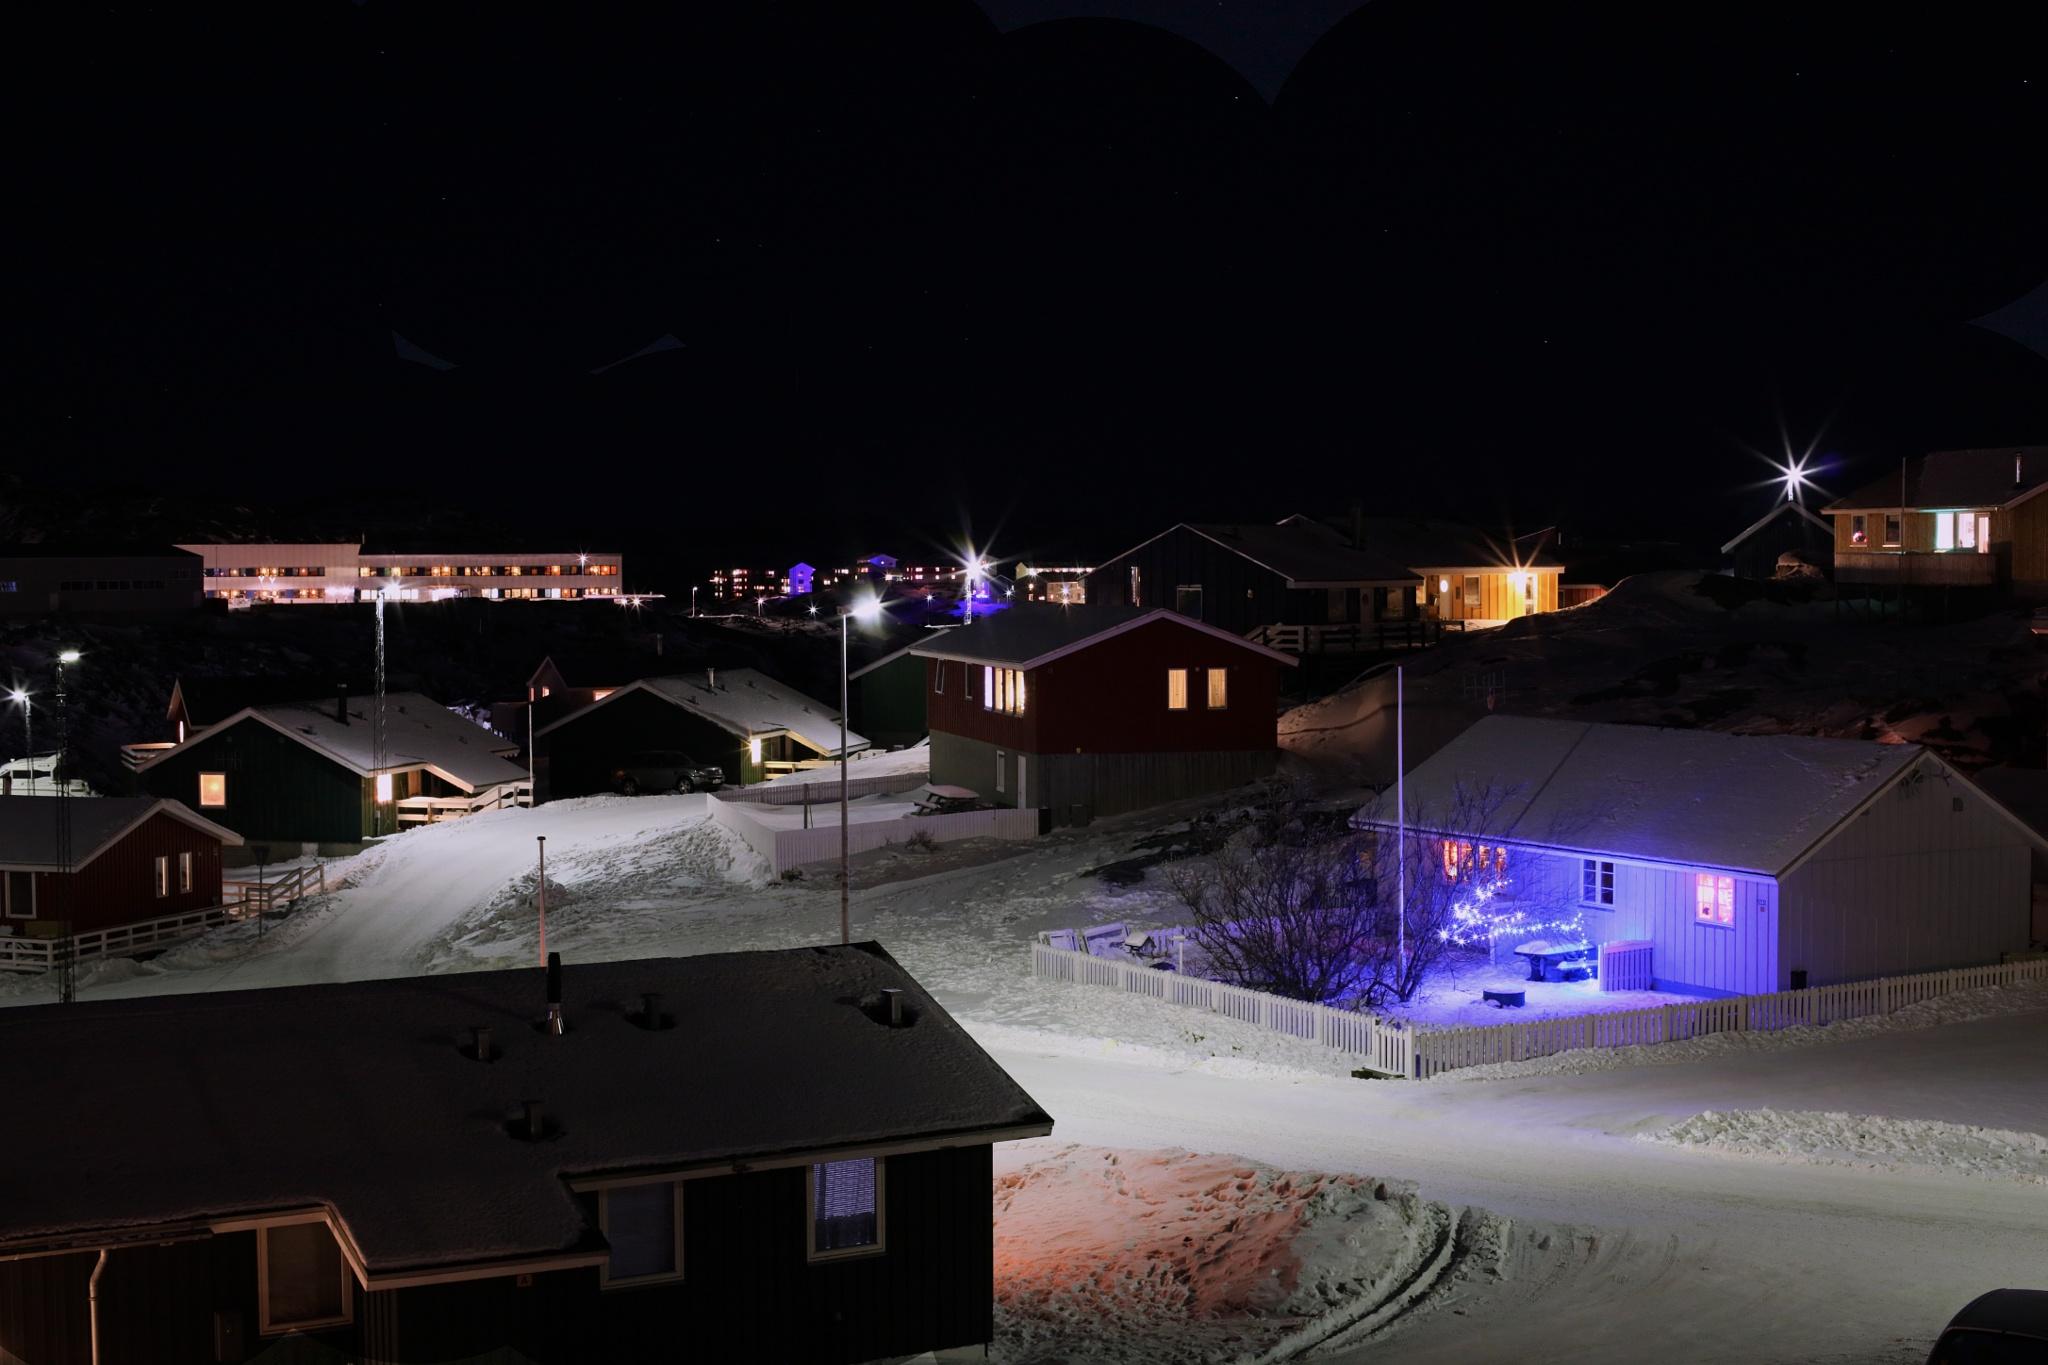 nuuk the daylight is short, 17 dec. by Tom Augo Lynge